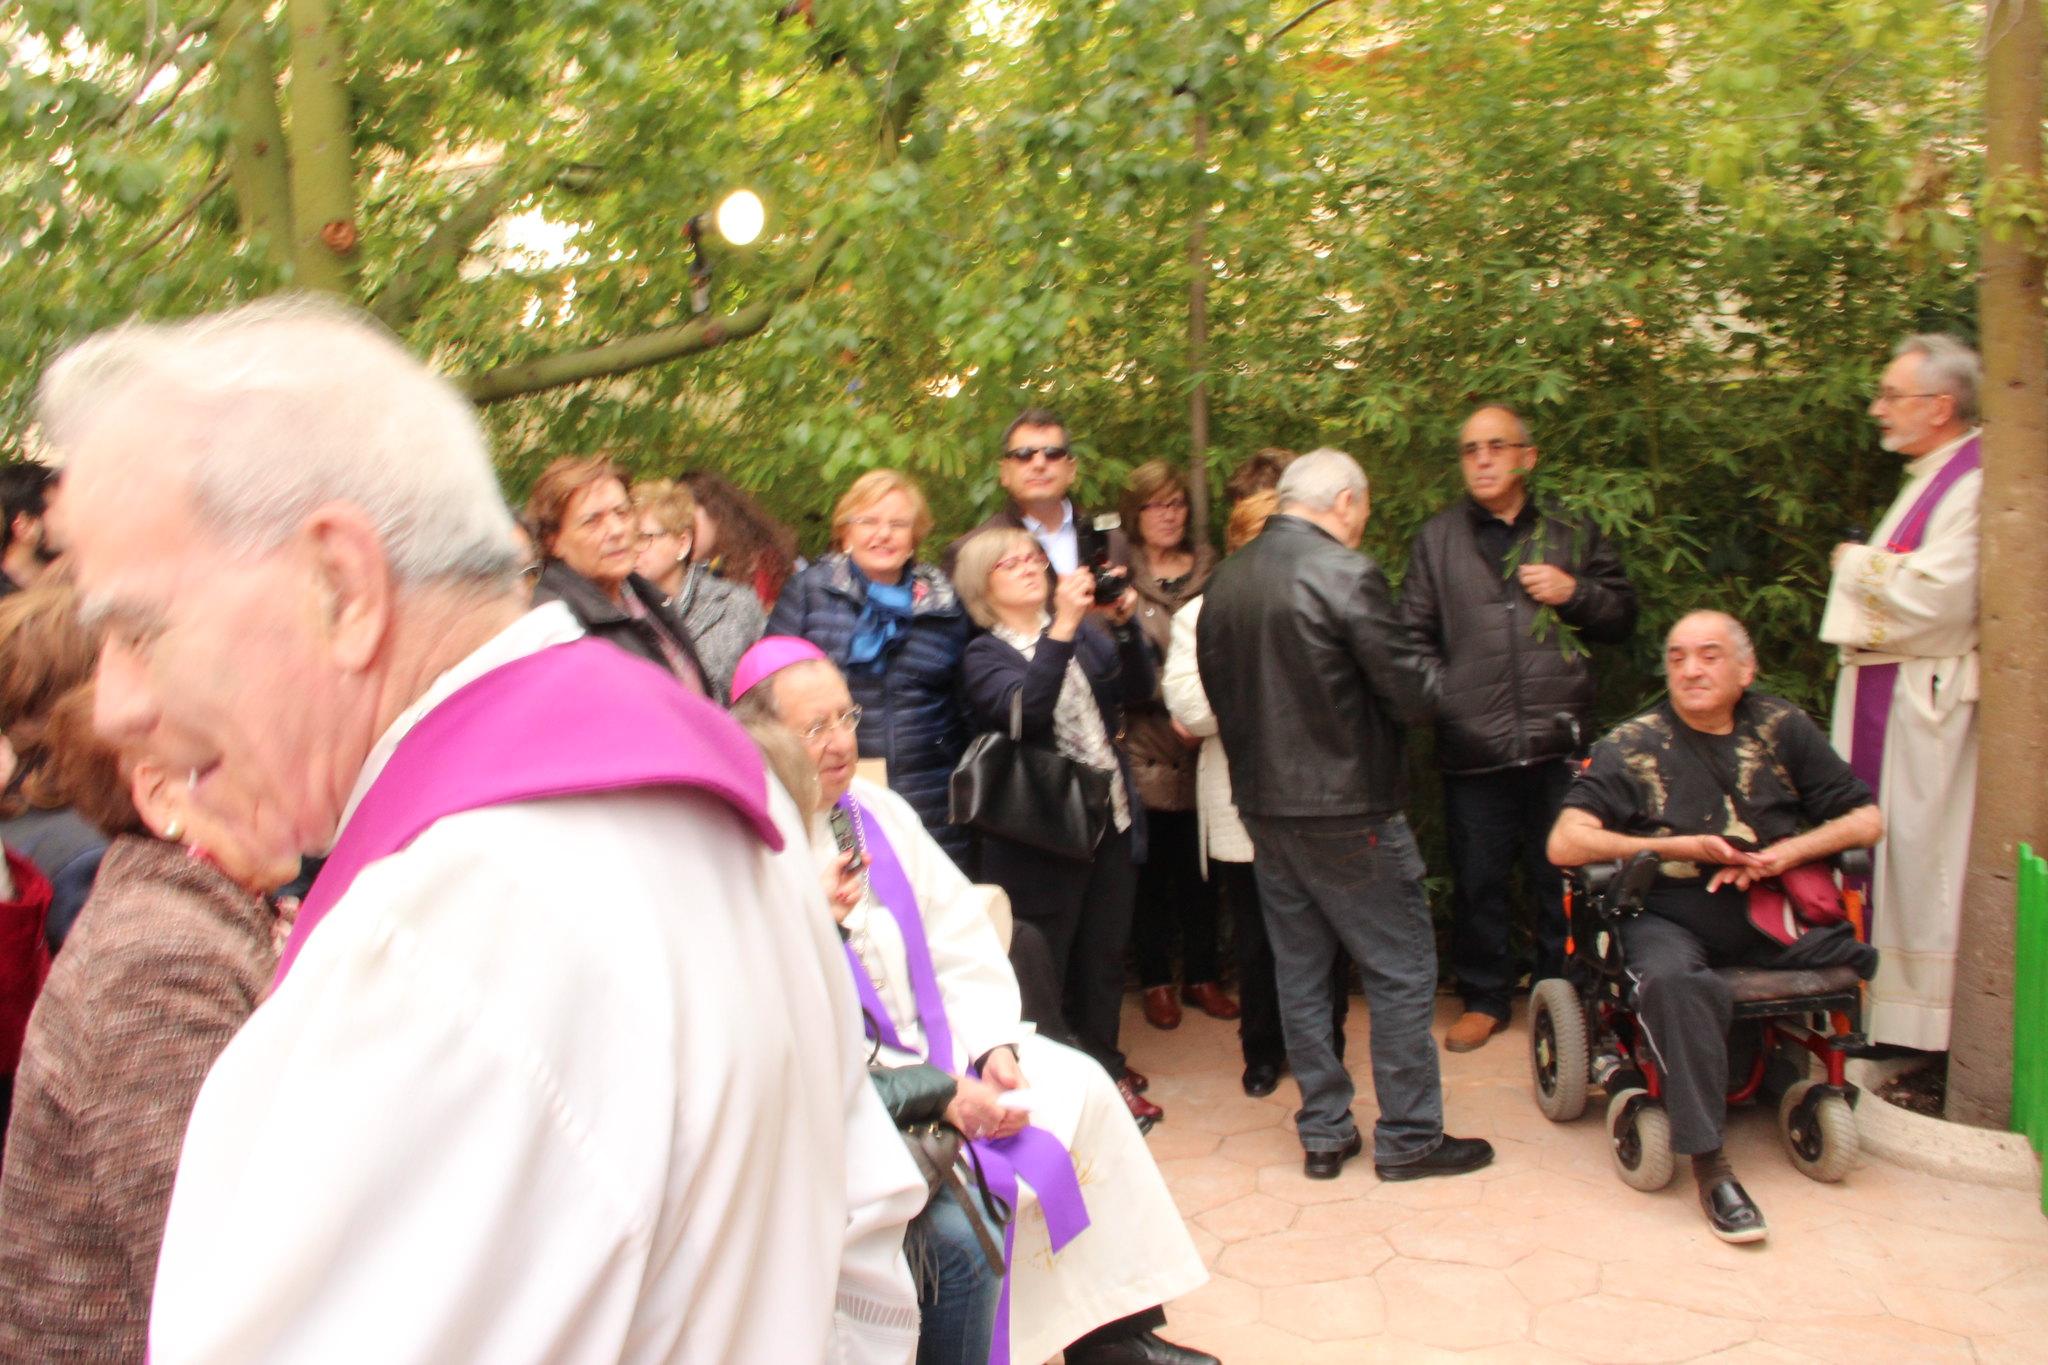 (2016-02-13) - Inauguración Virgen De Lourdes, La Molineta - Archivo La Molineta (068)